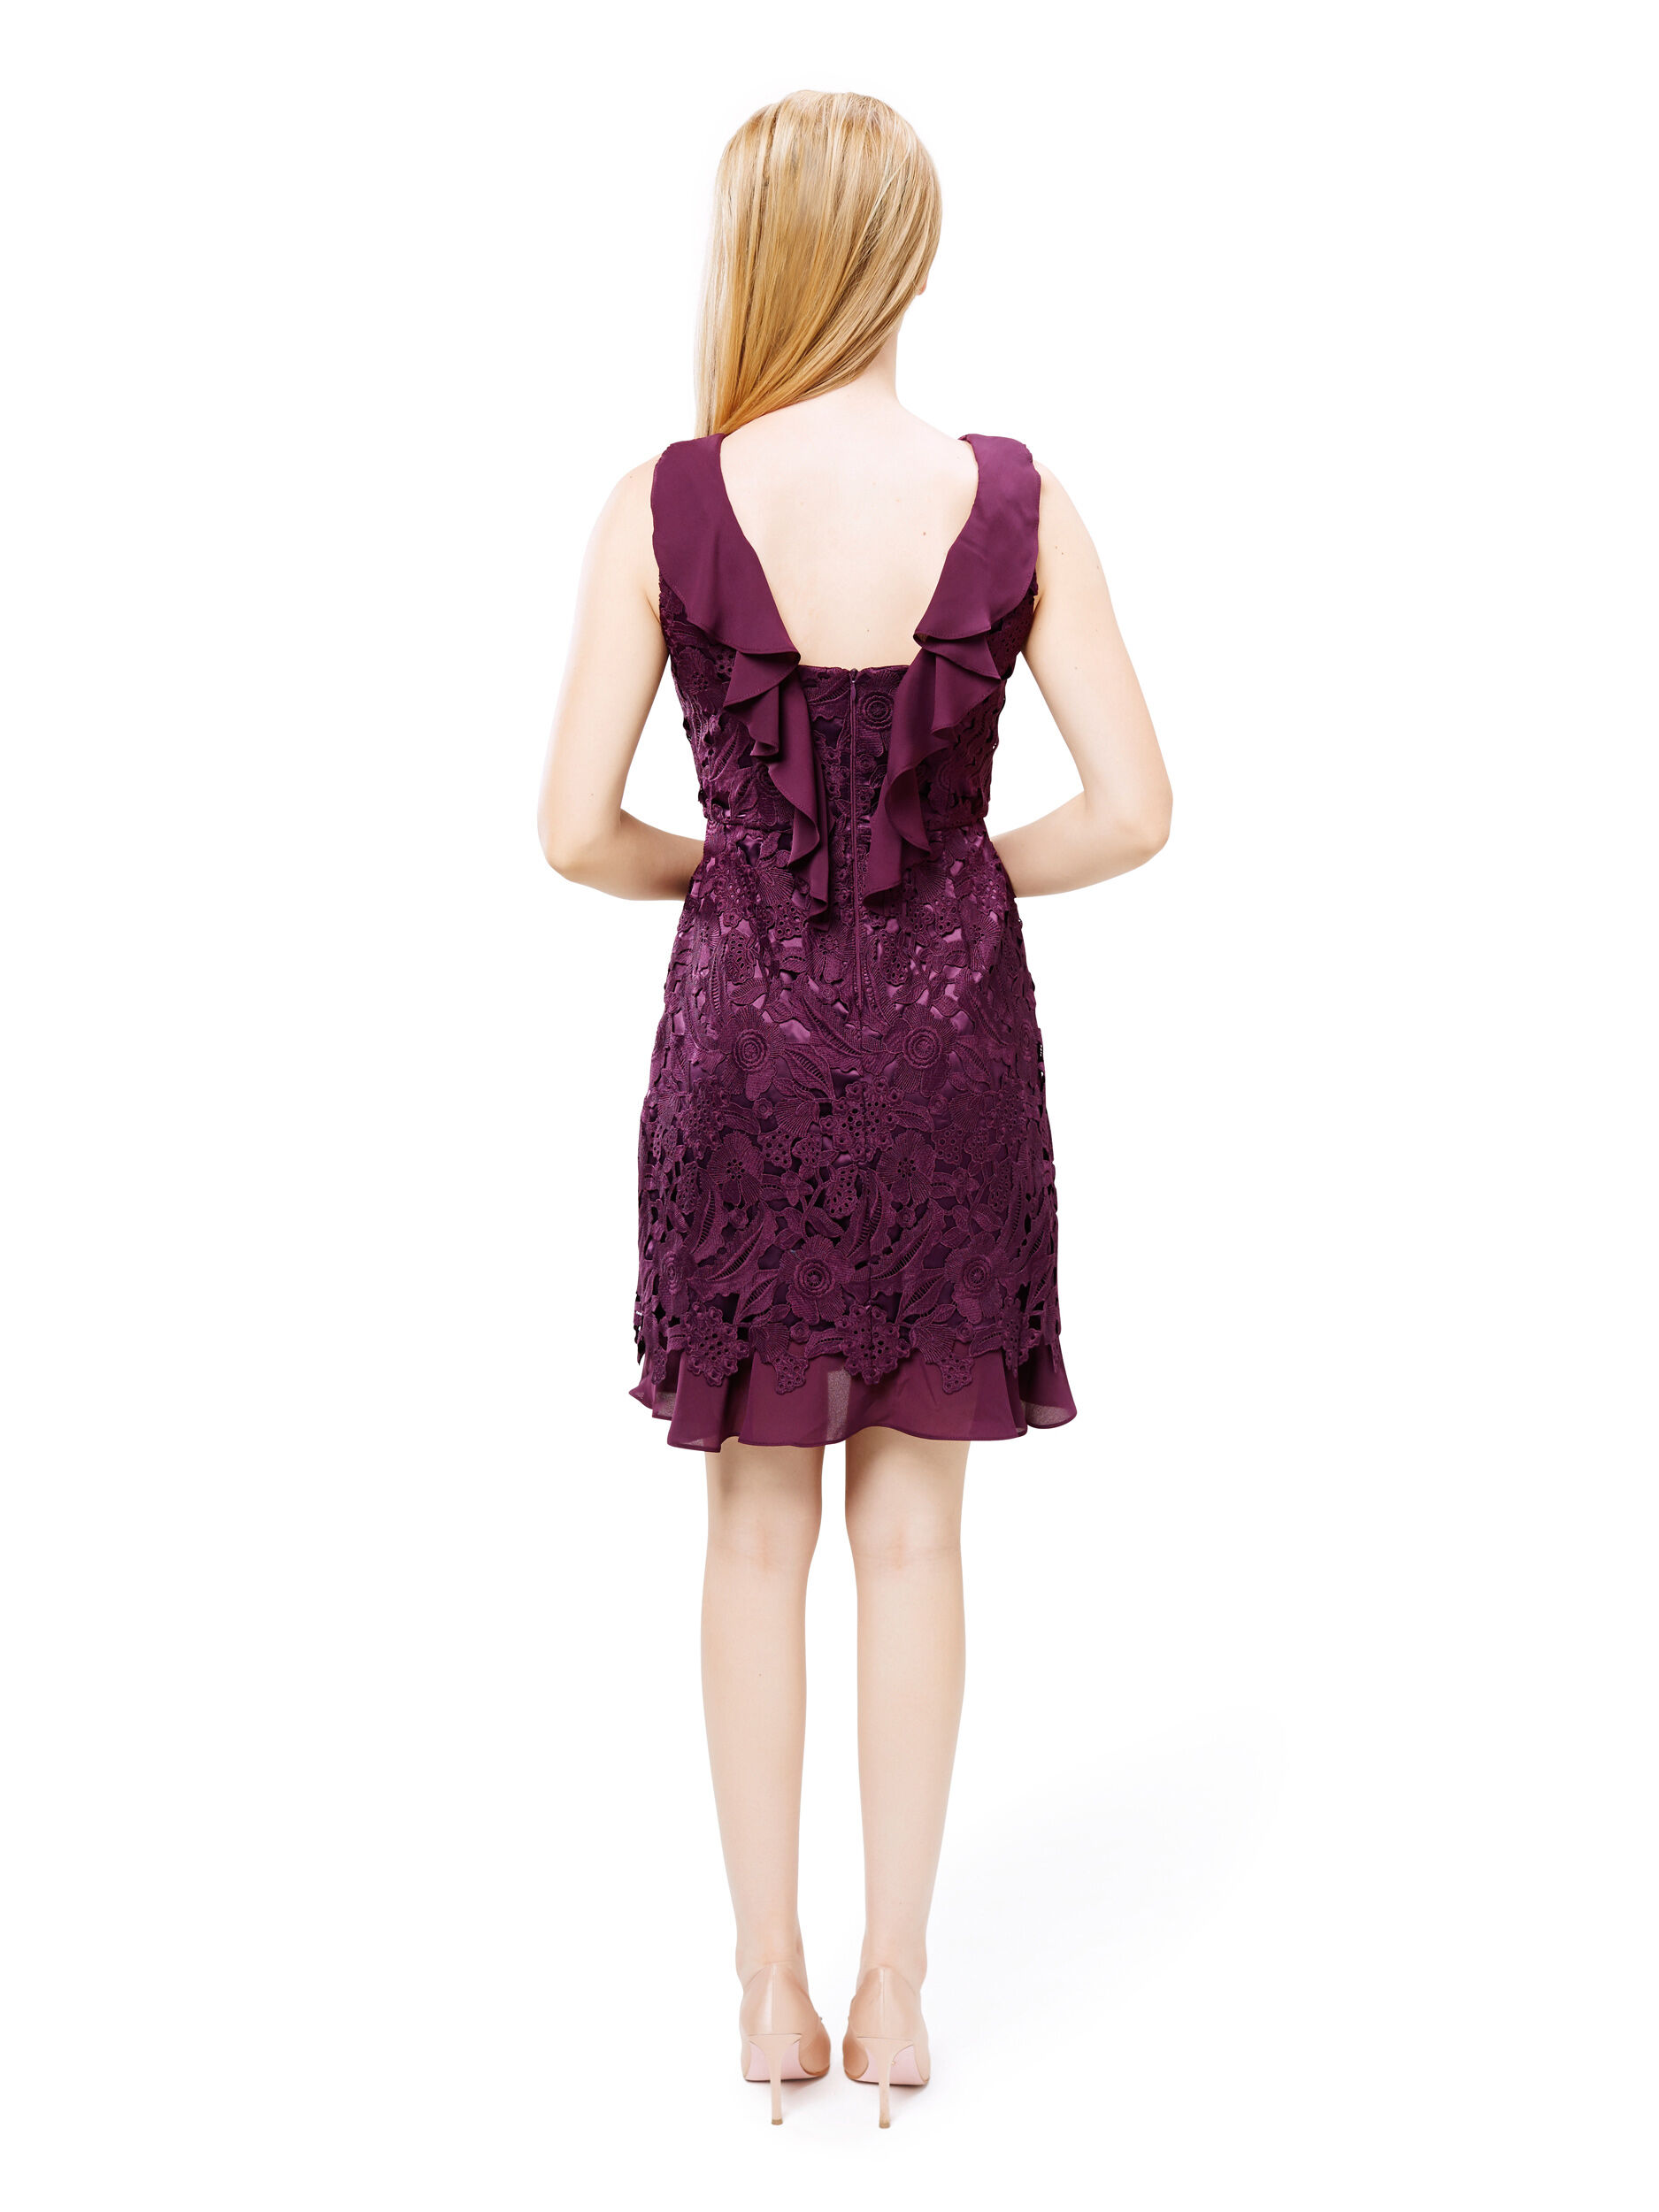 After Dark Dress